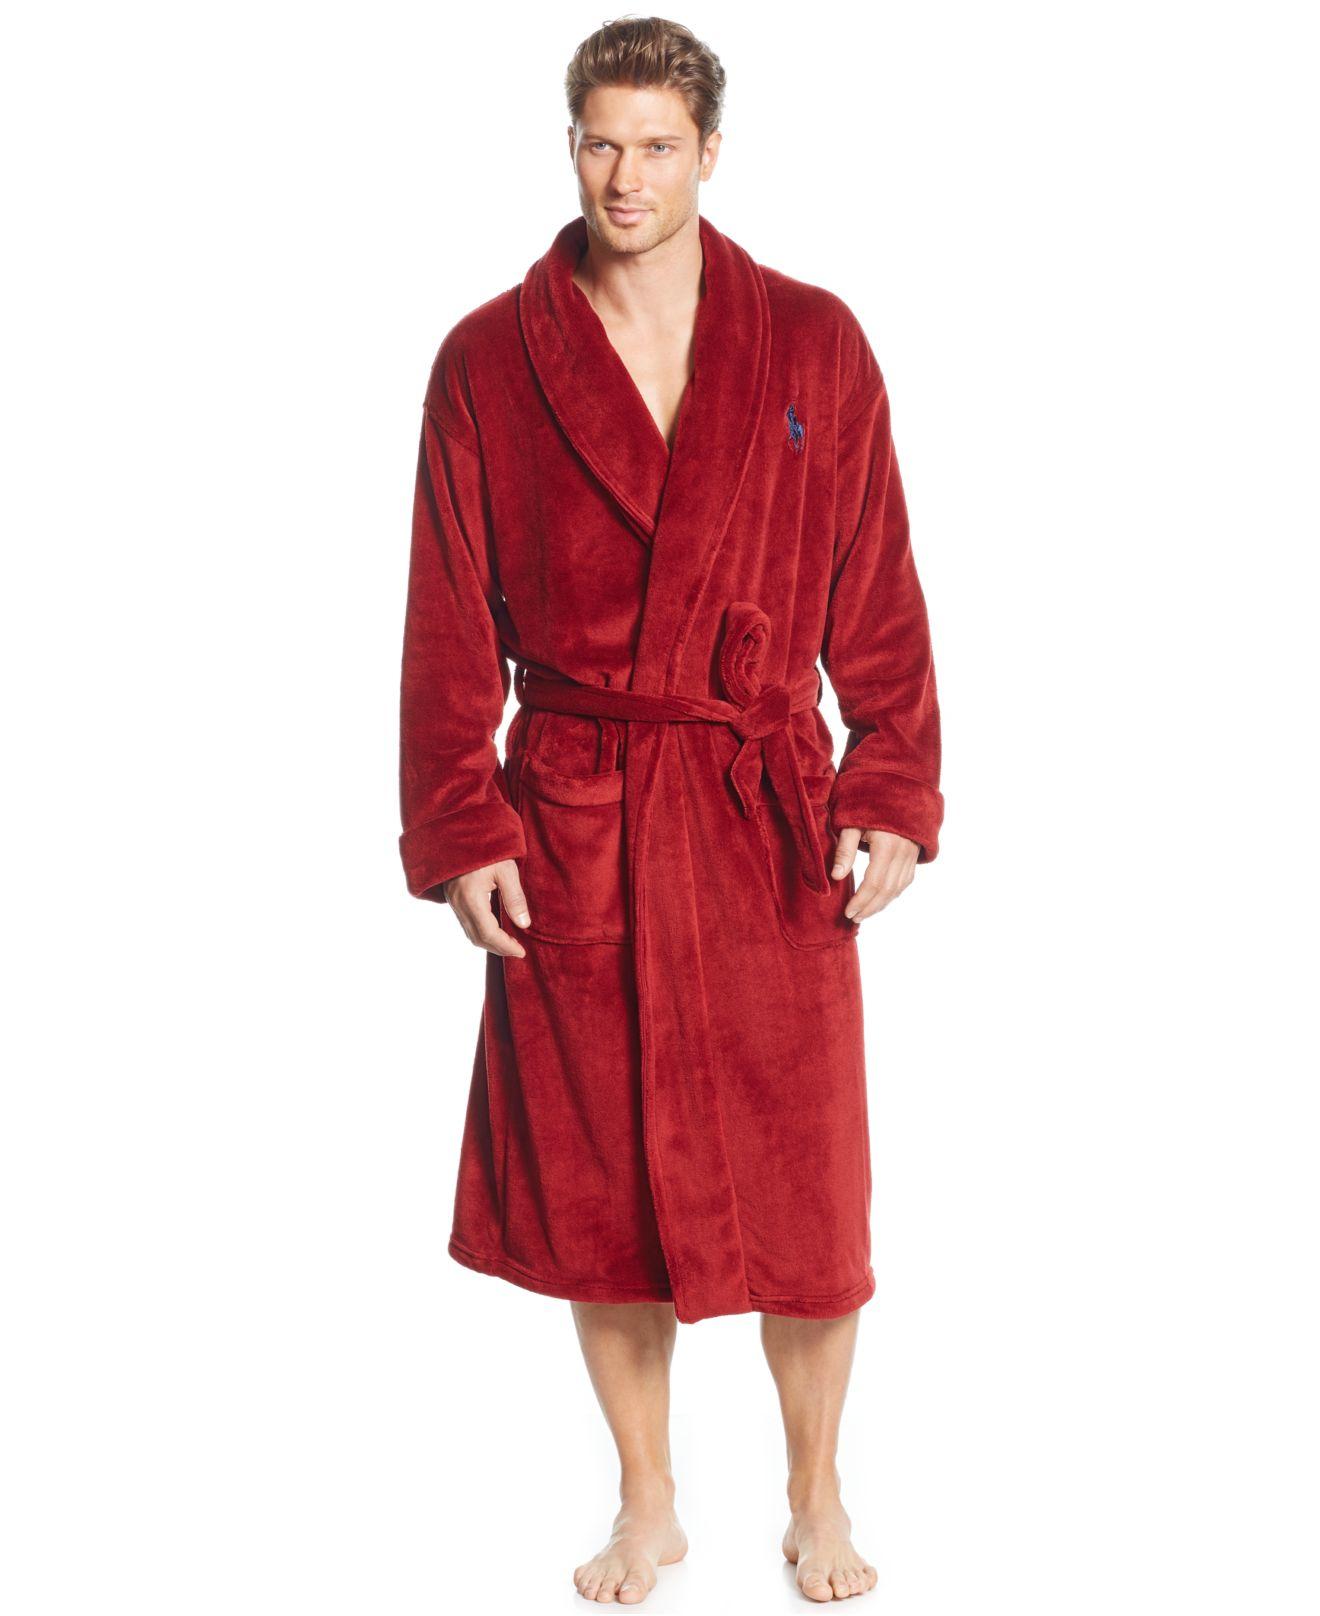 Lyst - Polo Ralph Lauren Terry Kimono Robe in Black for Men